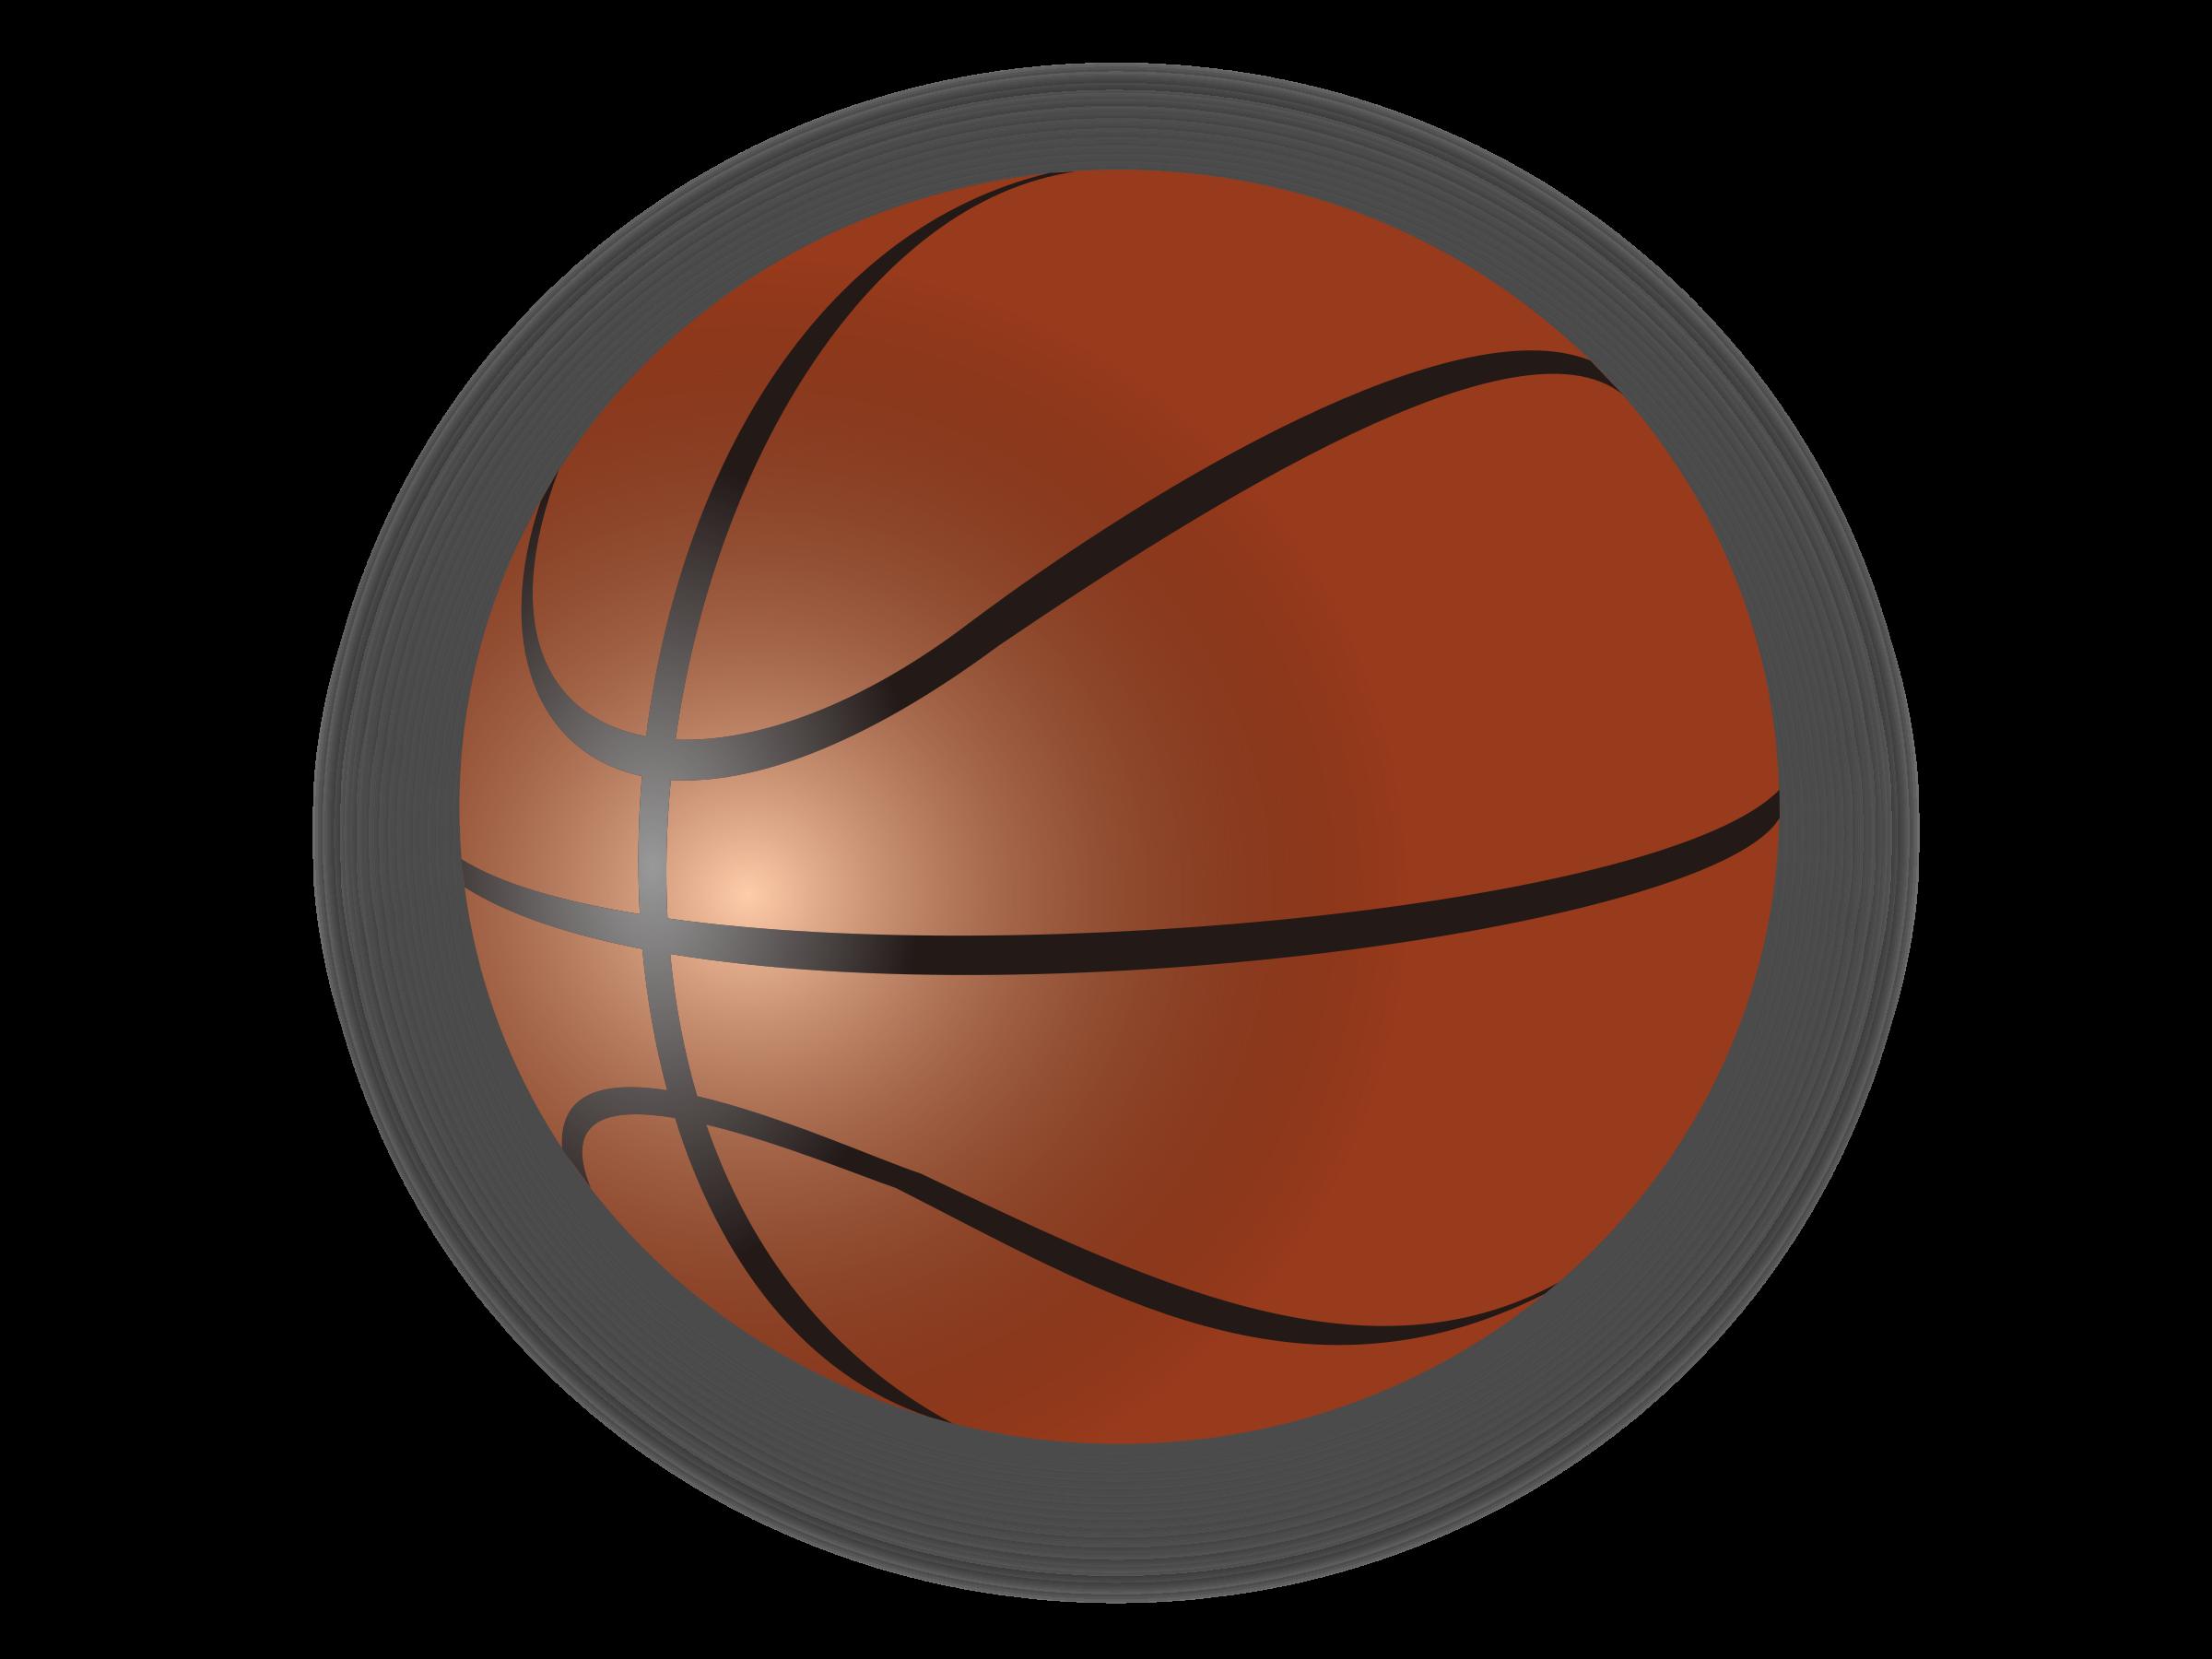 Big image. Clipart png basketball